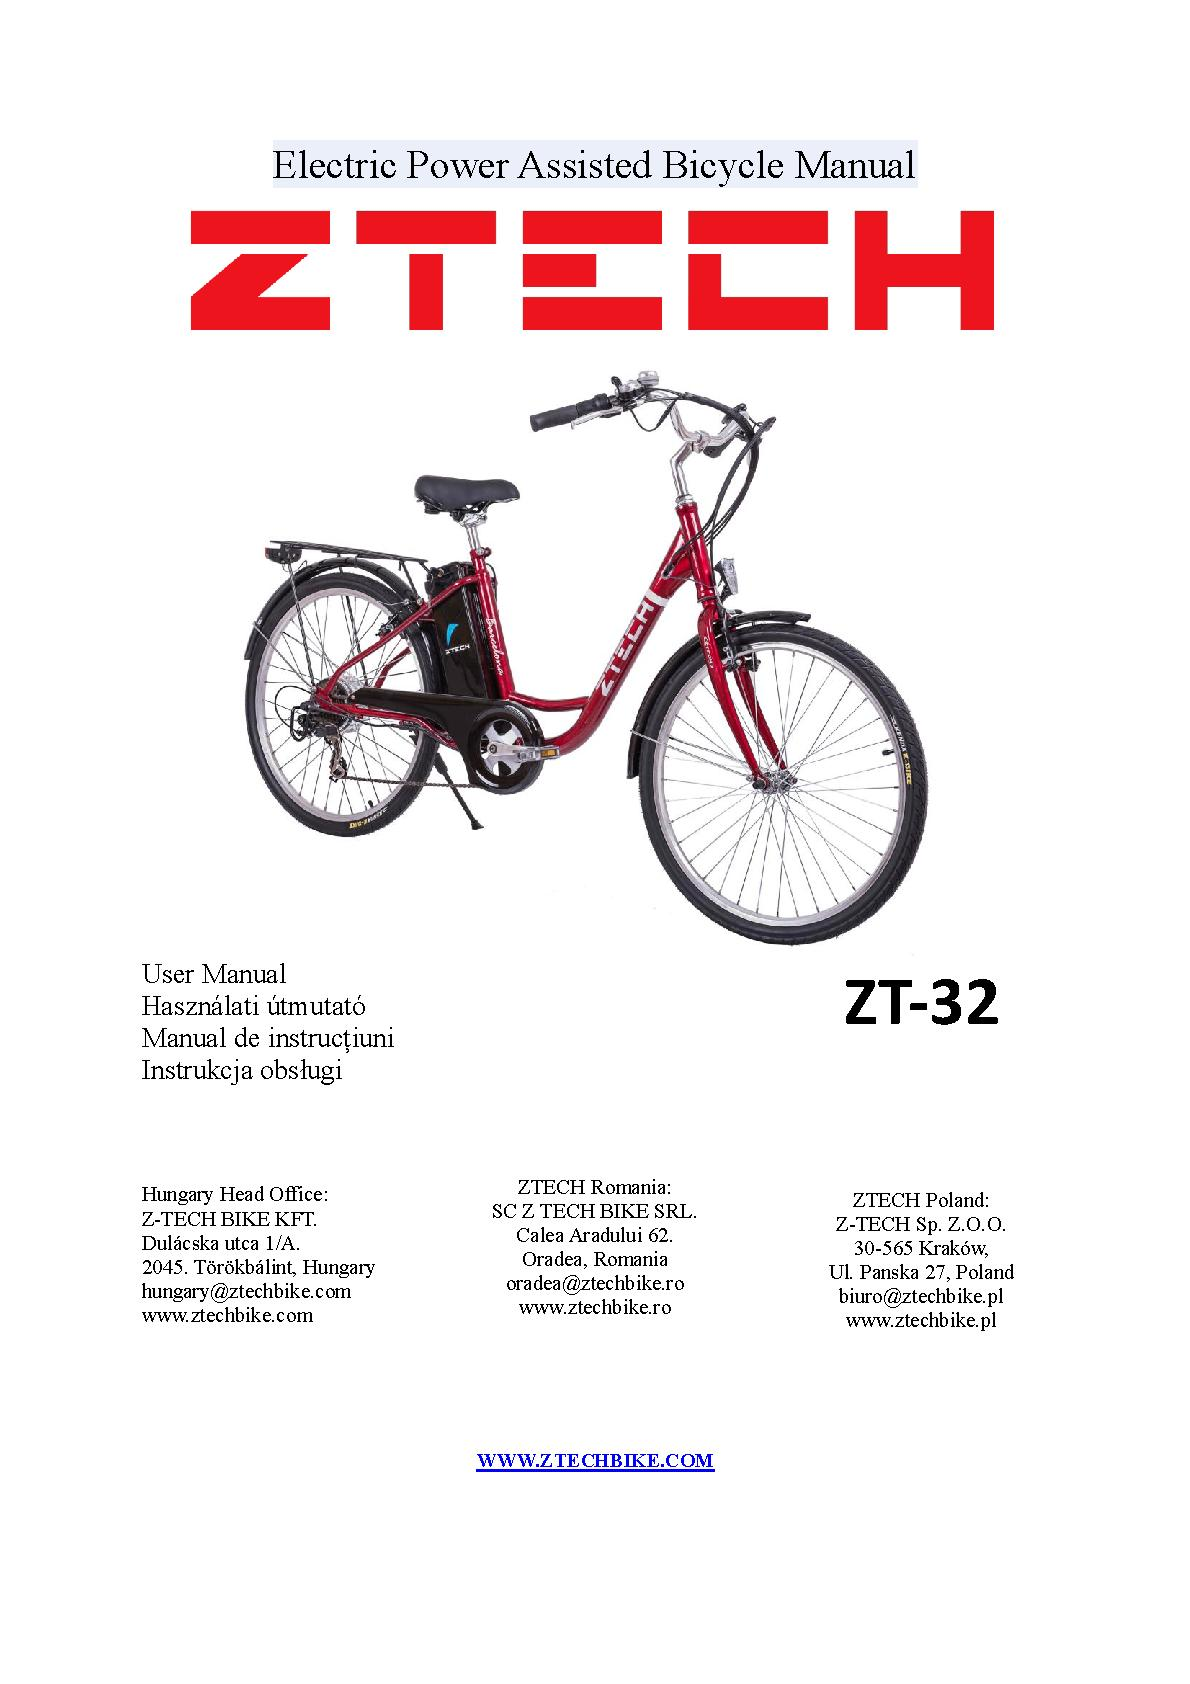 ZT-32 electric bicycle userguide.pdf   PDF Host